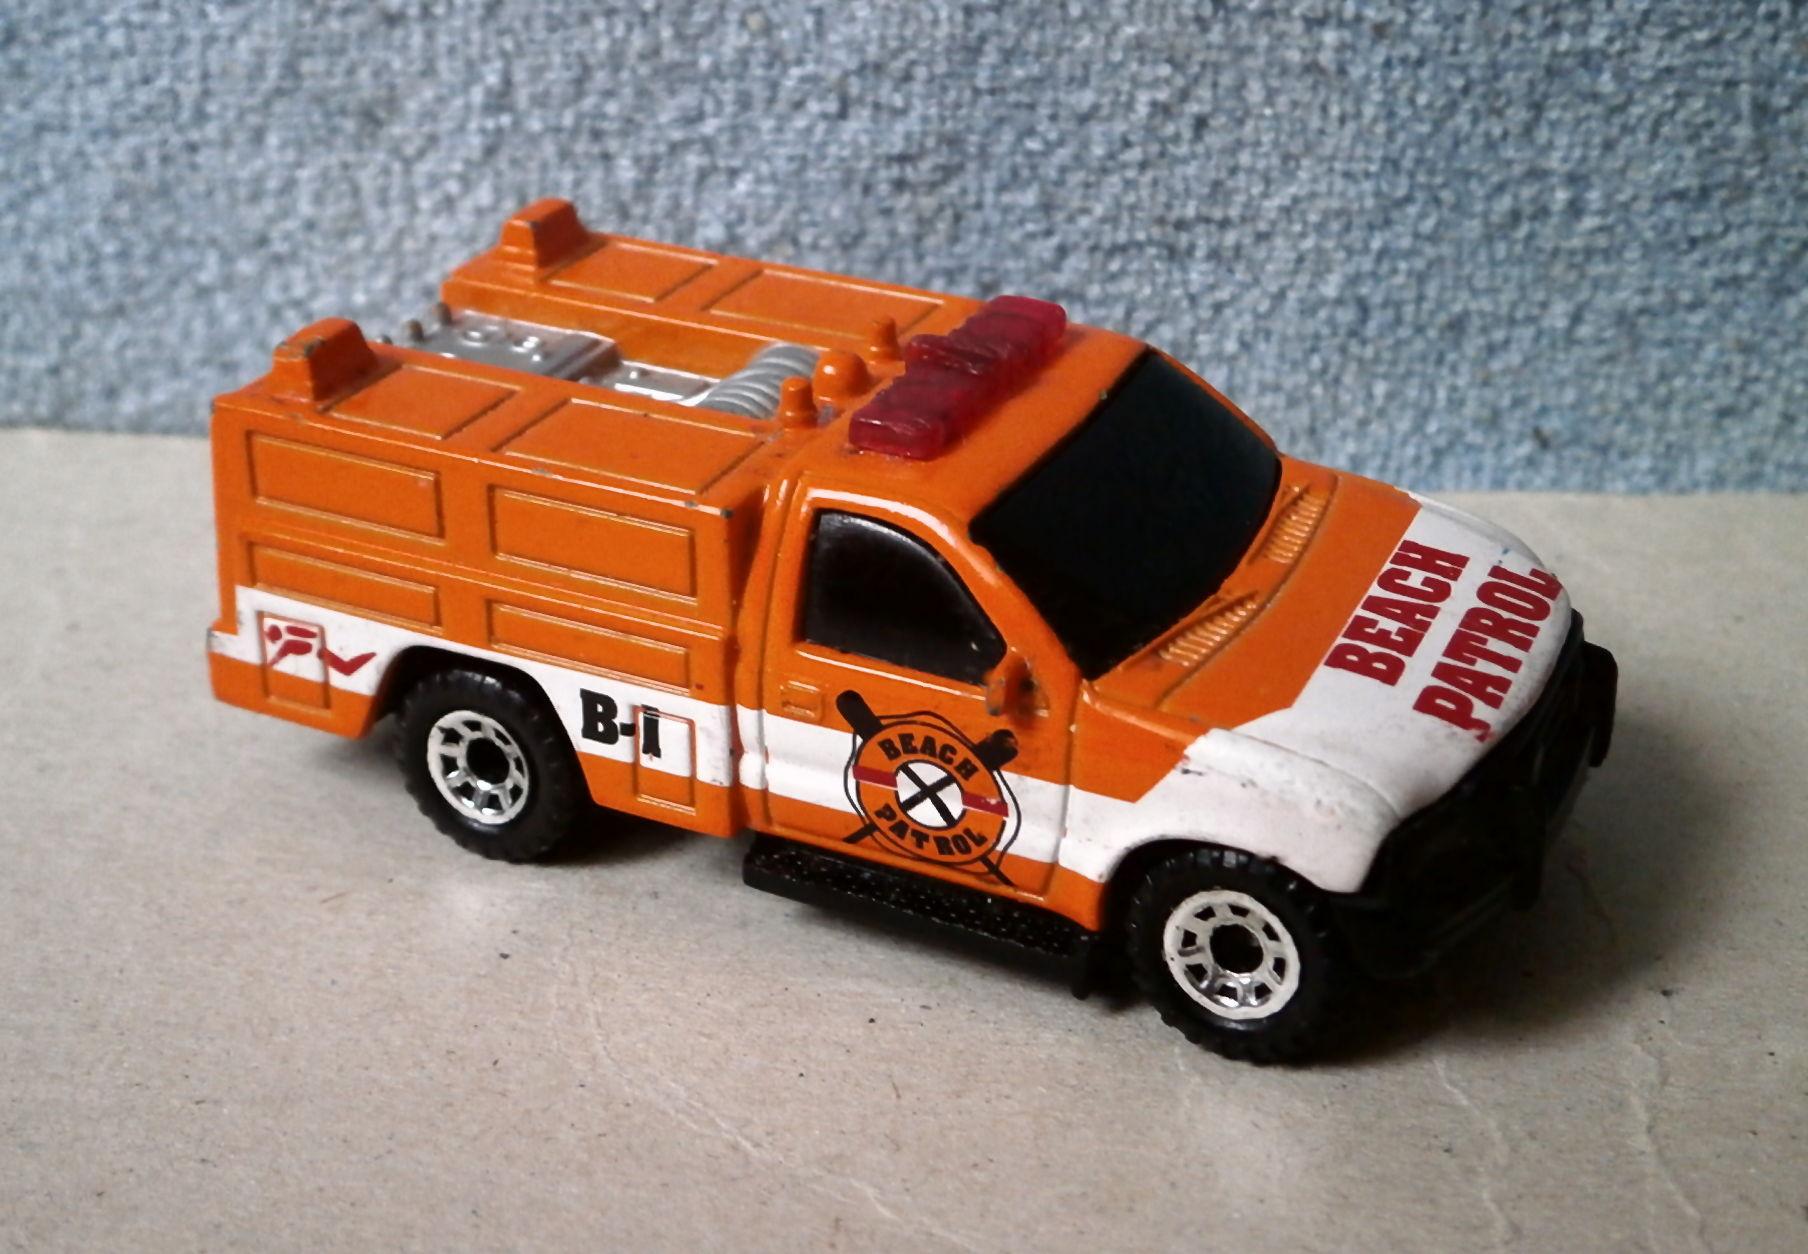 Rescue Truck | Matchbox Cars Wiki | FANDOM powered by Wikia